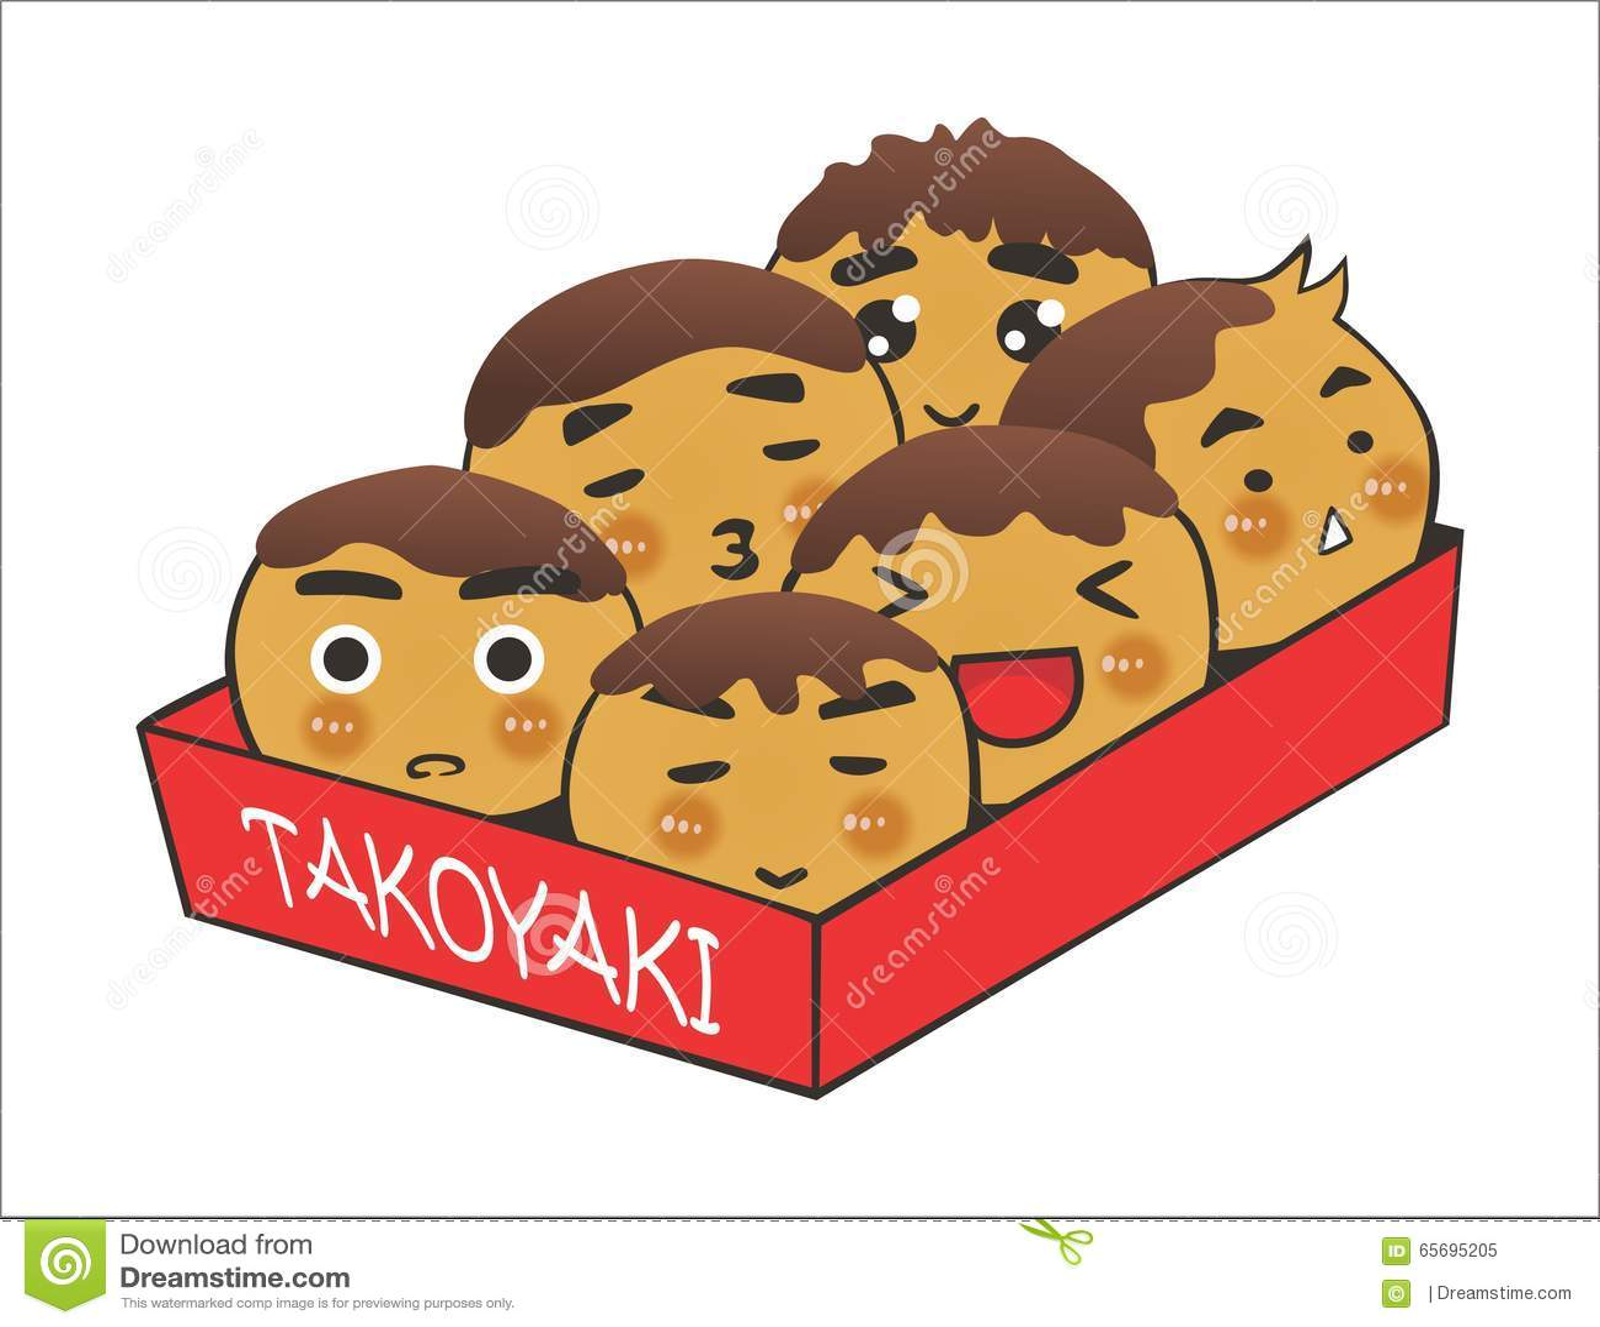 Famous Street Food In Japan